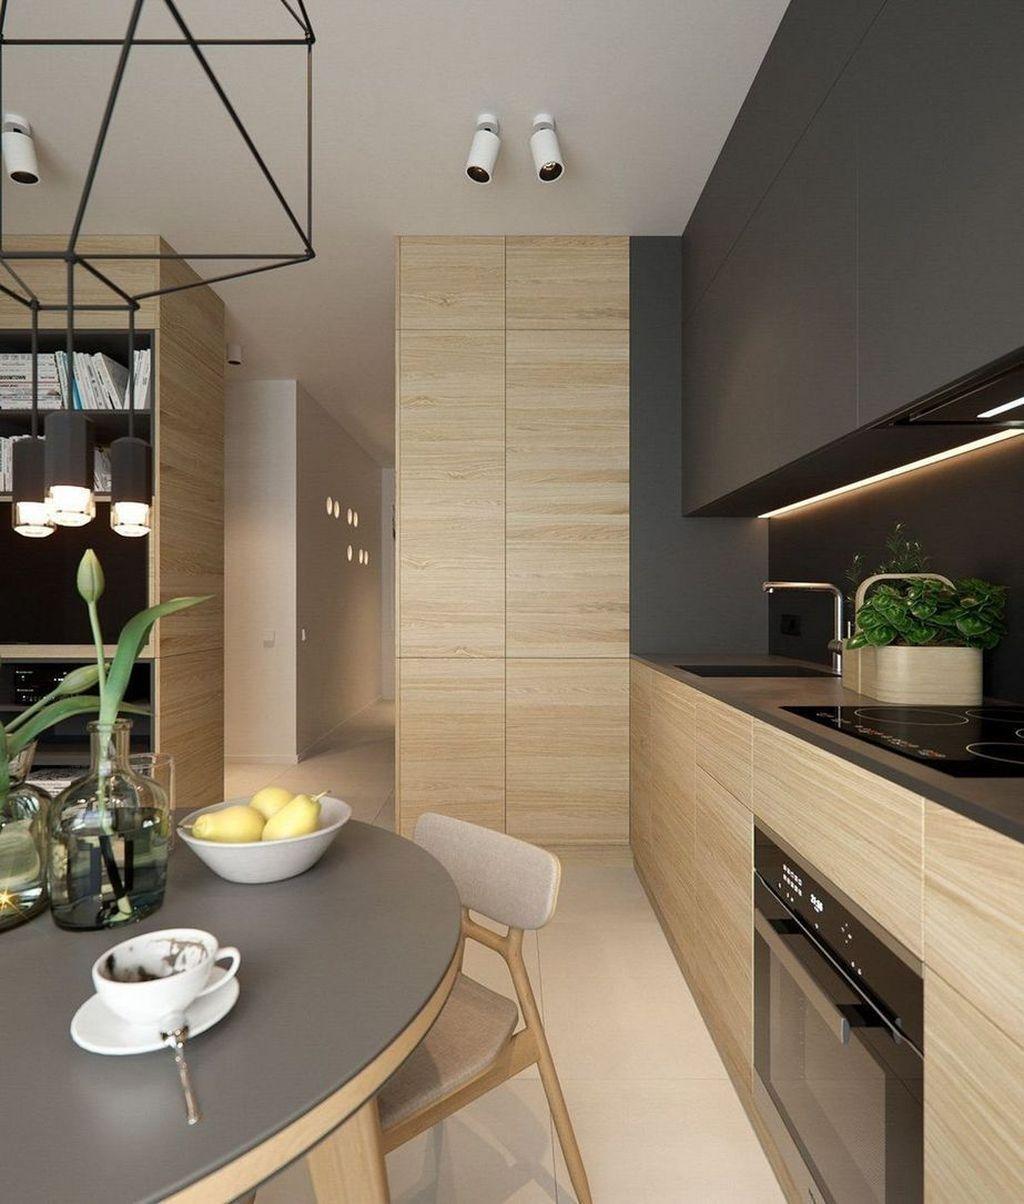 35 amazing small apartment kitchen ideas kitchen pinterest rh pinterest com